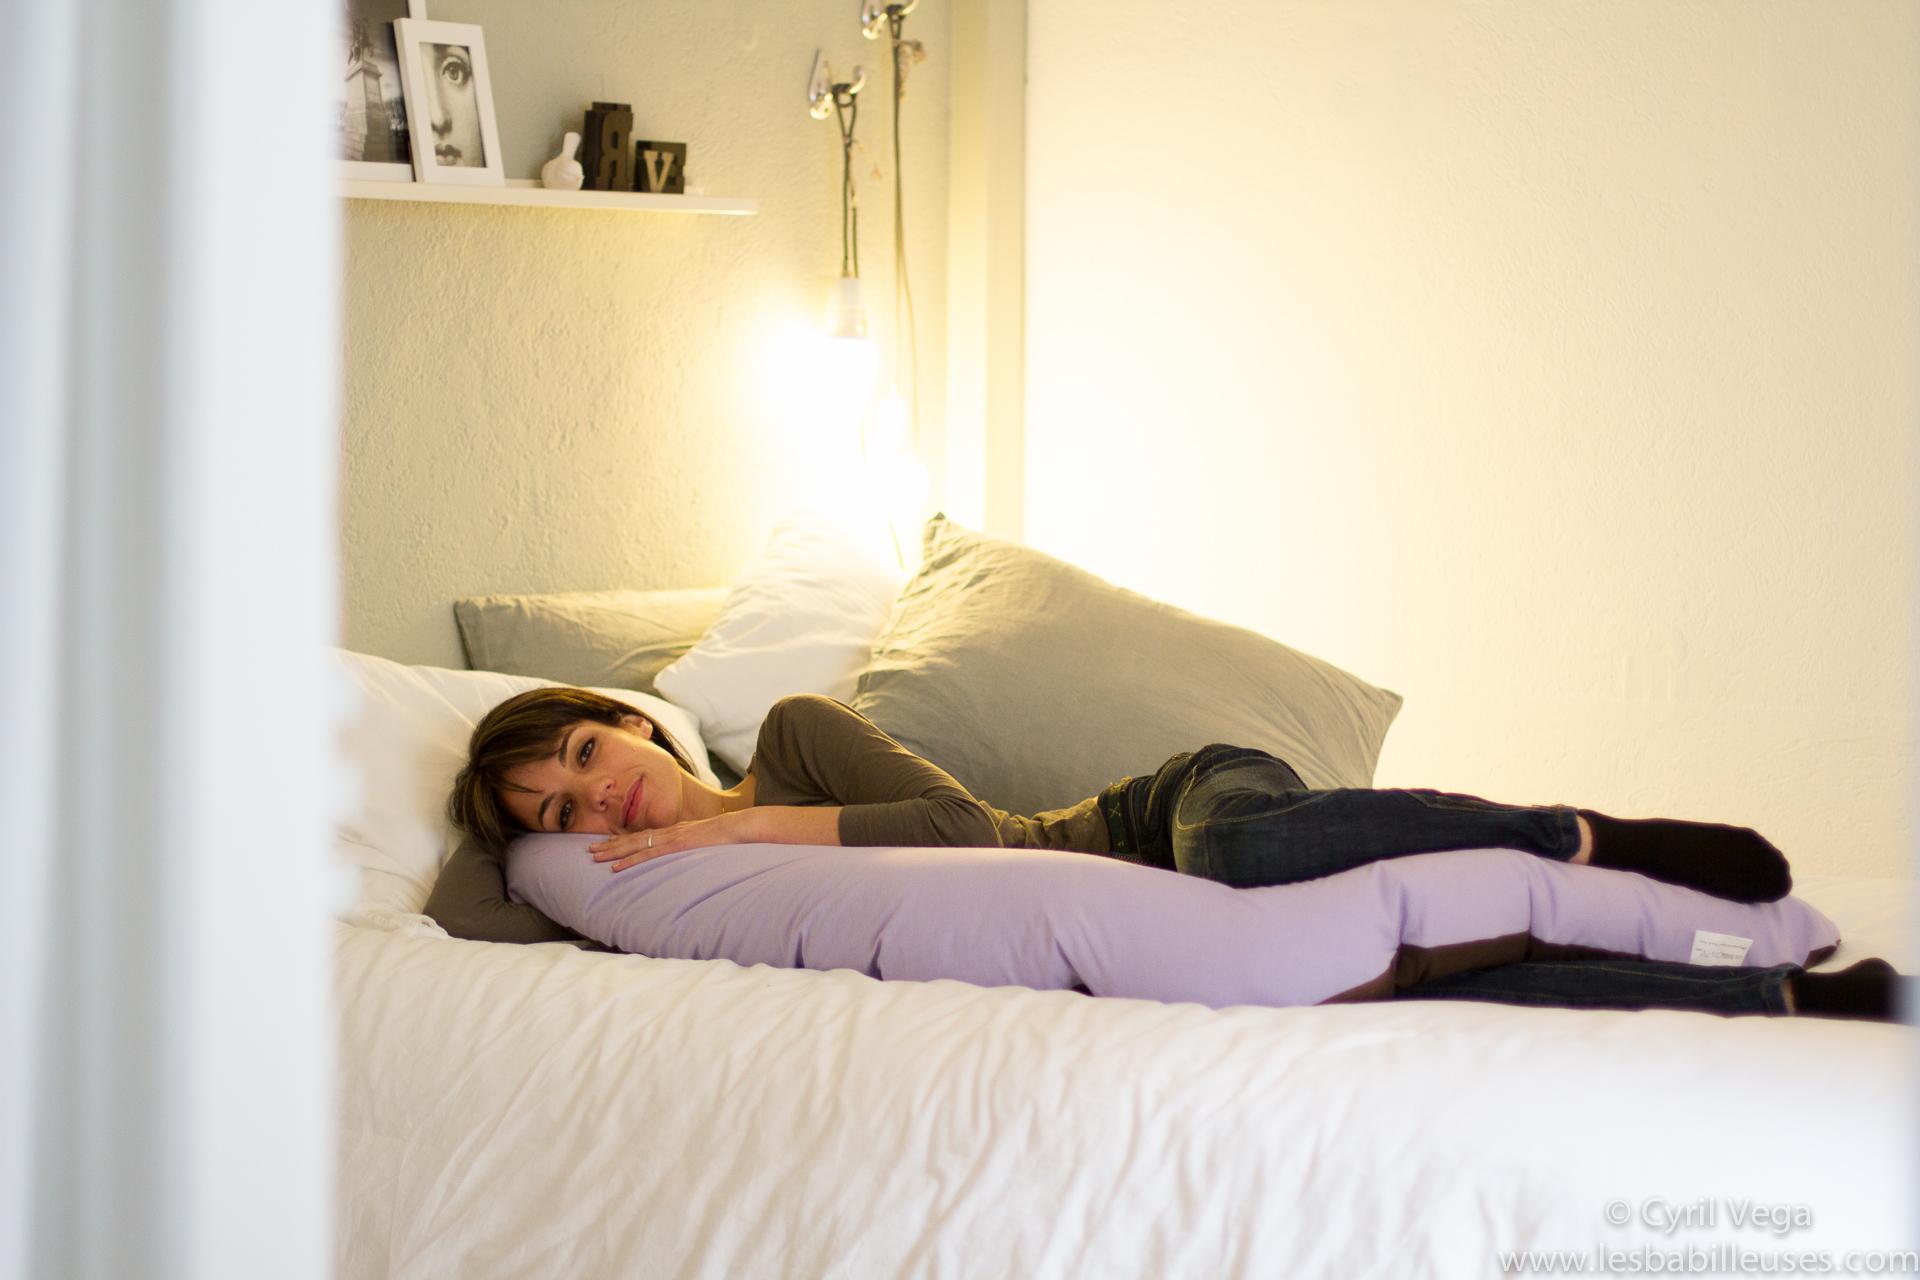 Babyfrancecom - Bien dormir pendant la grossesse